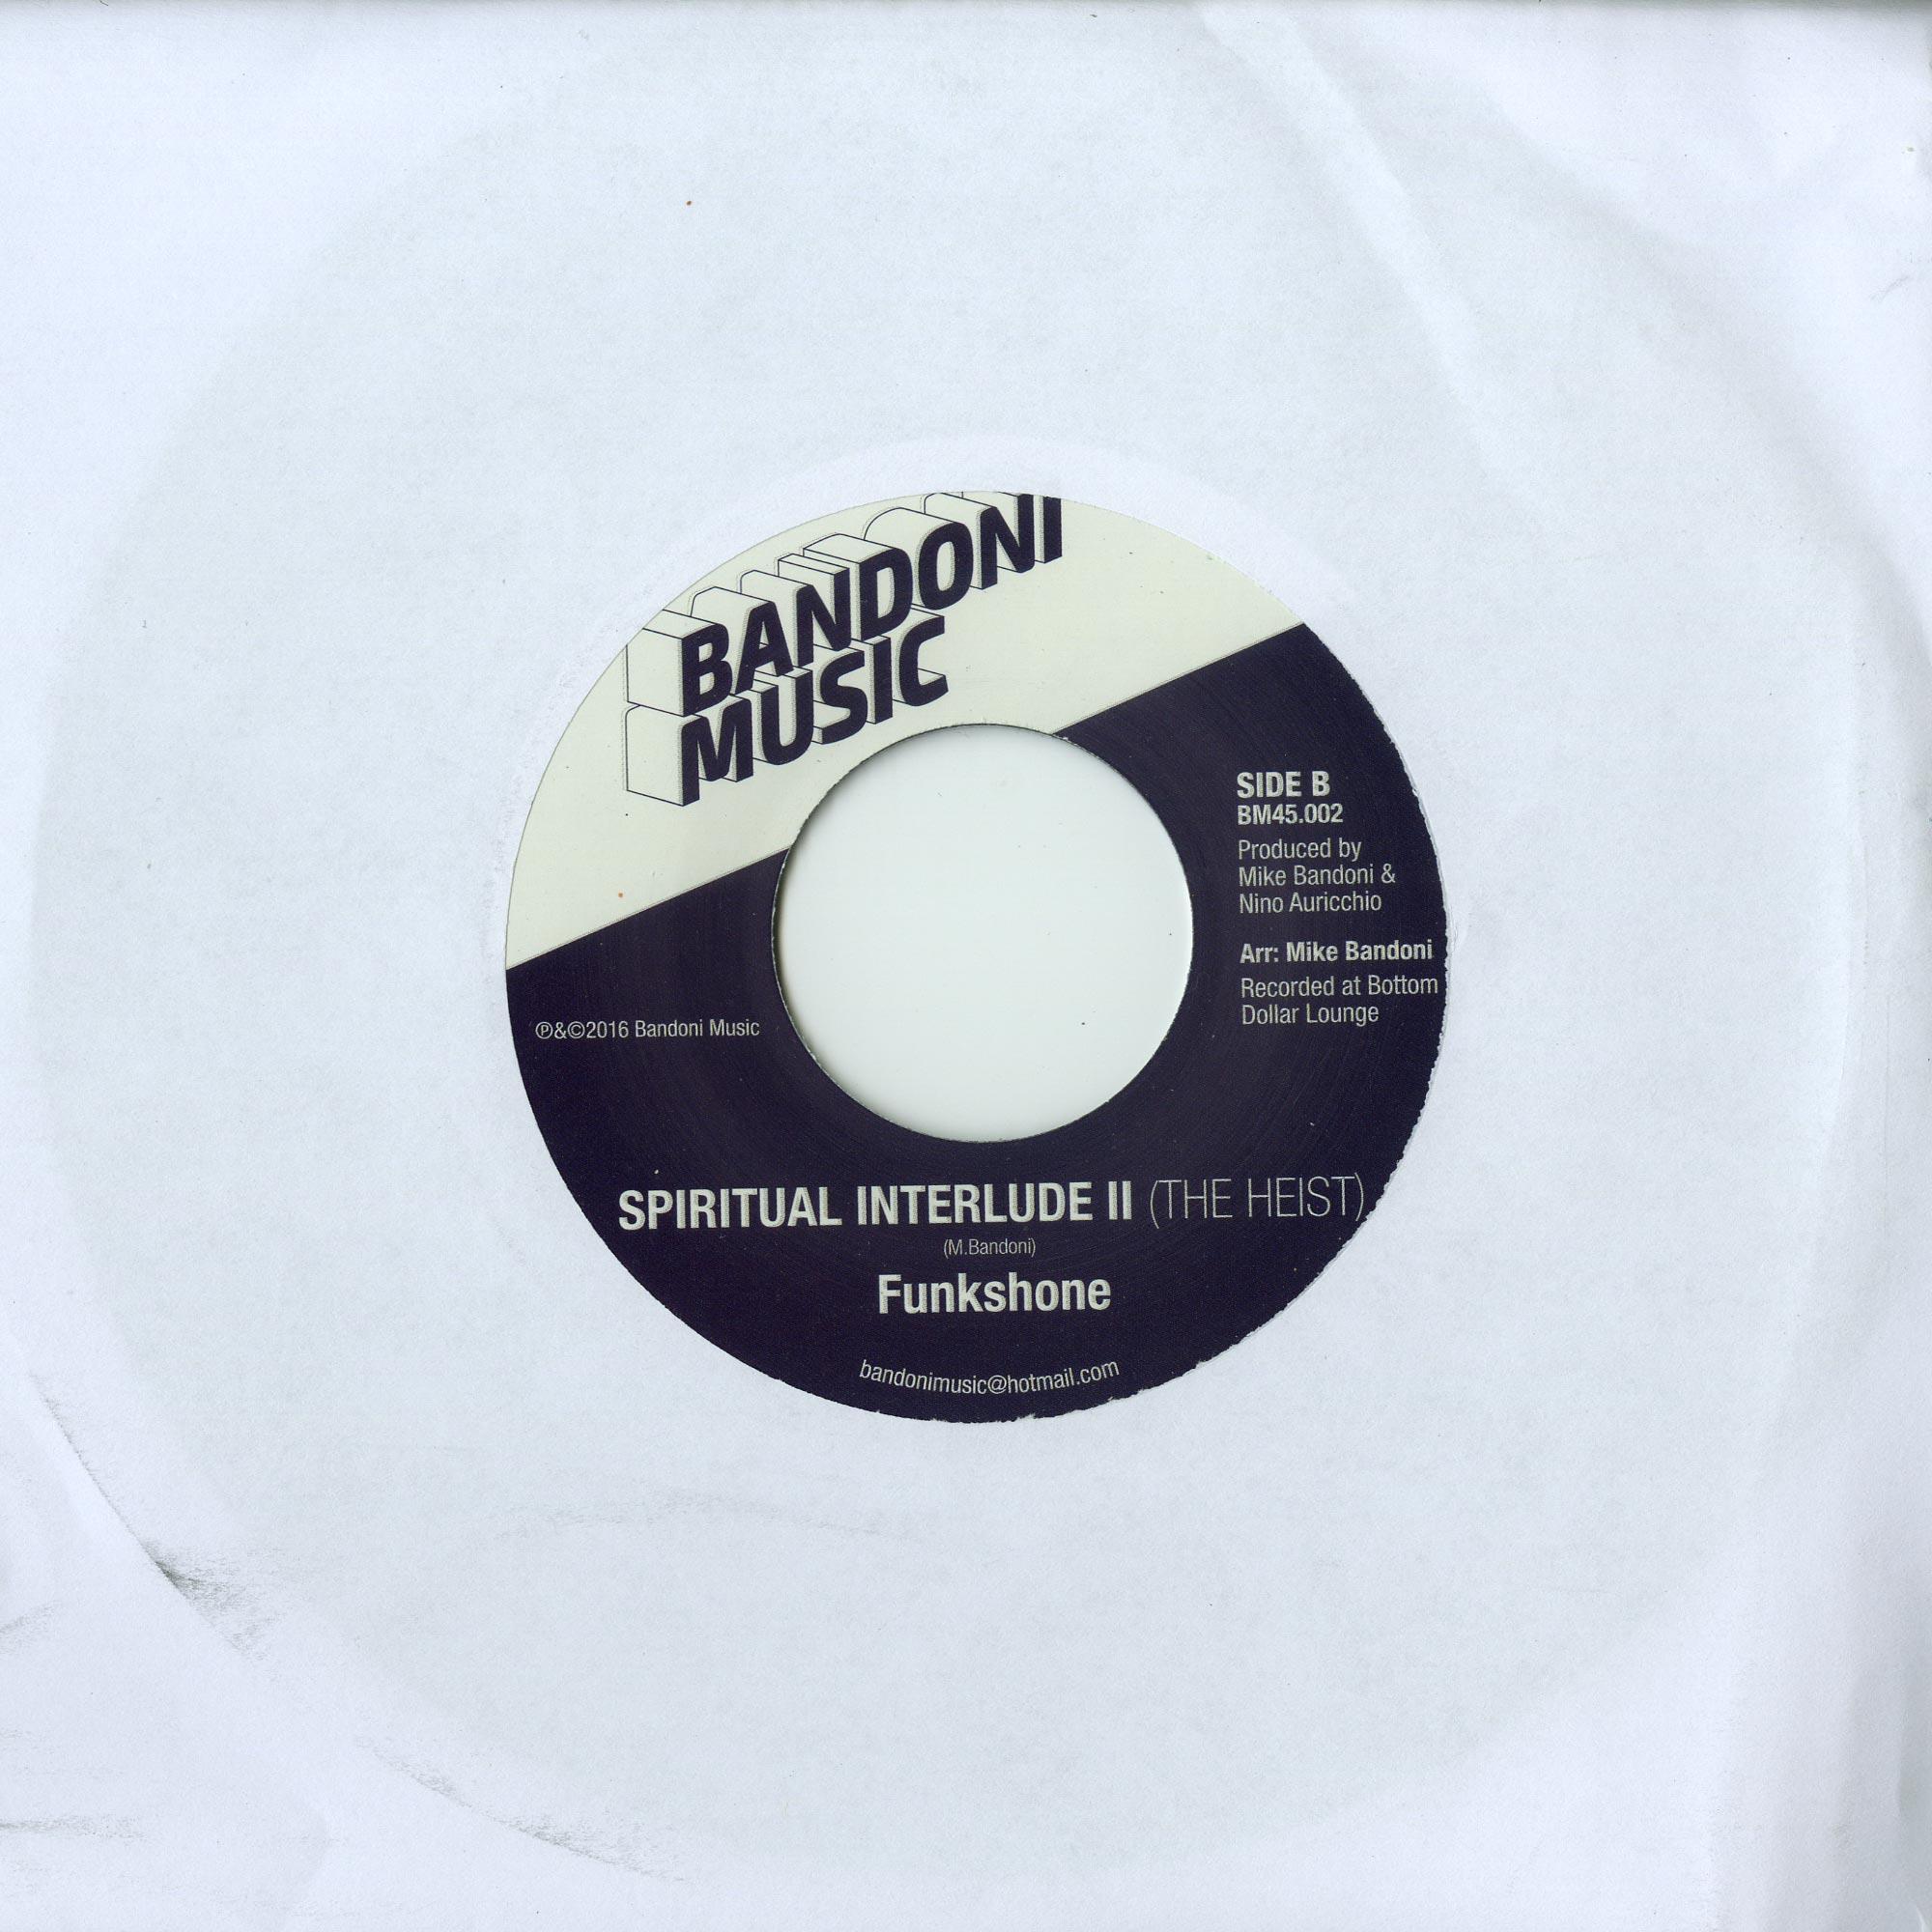 Funkshone - THE STRUT / SPRITUAL INTERLUDE